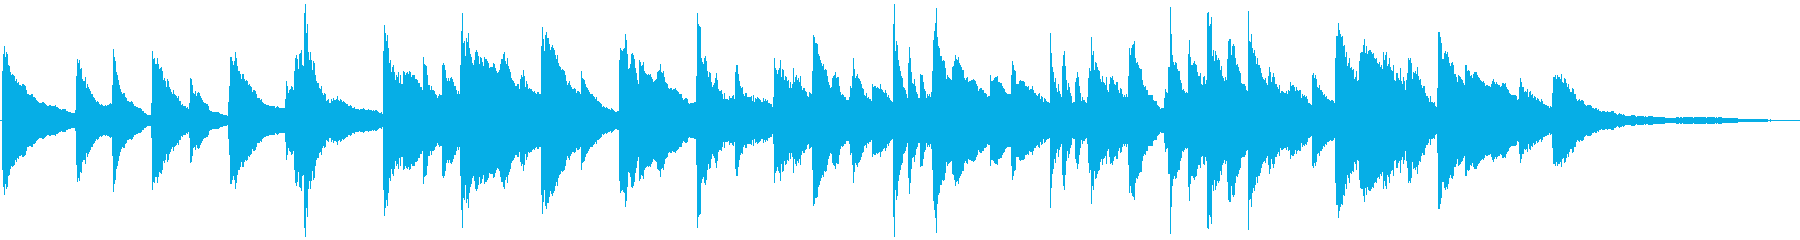 youtube感動映像に切ないピアノソロの再生済みの波形